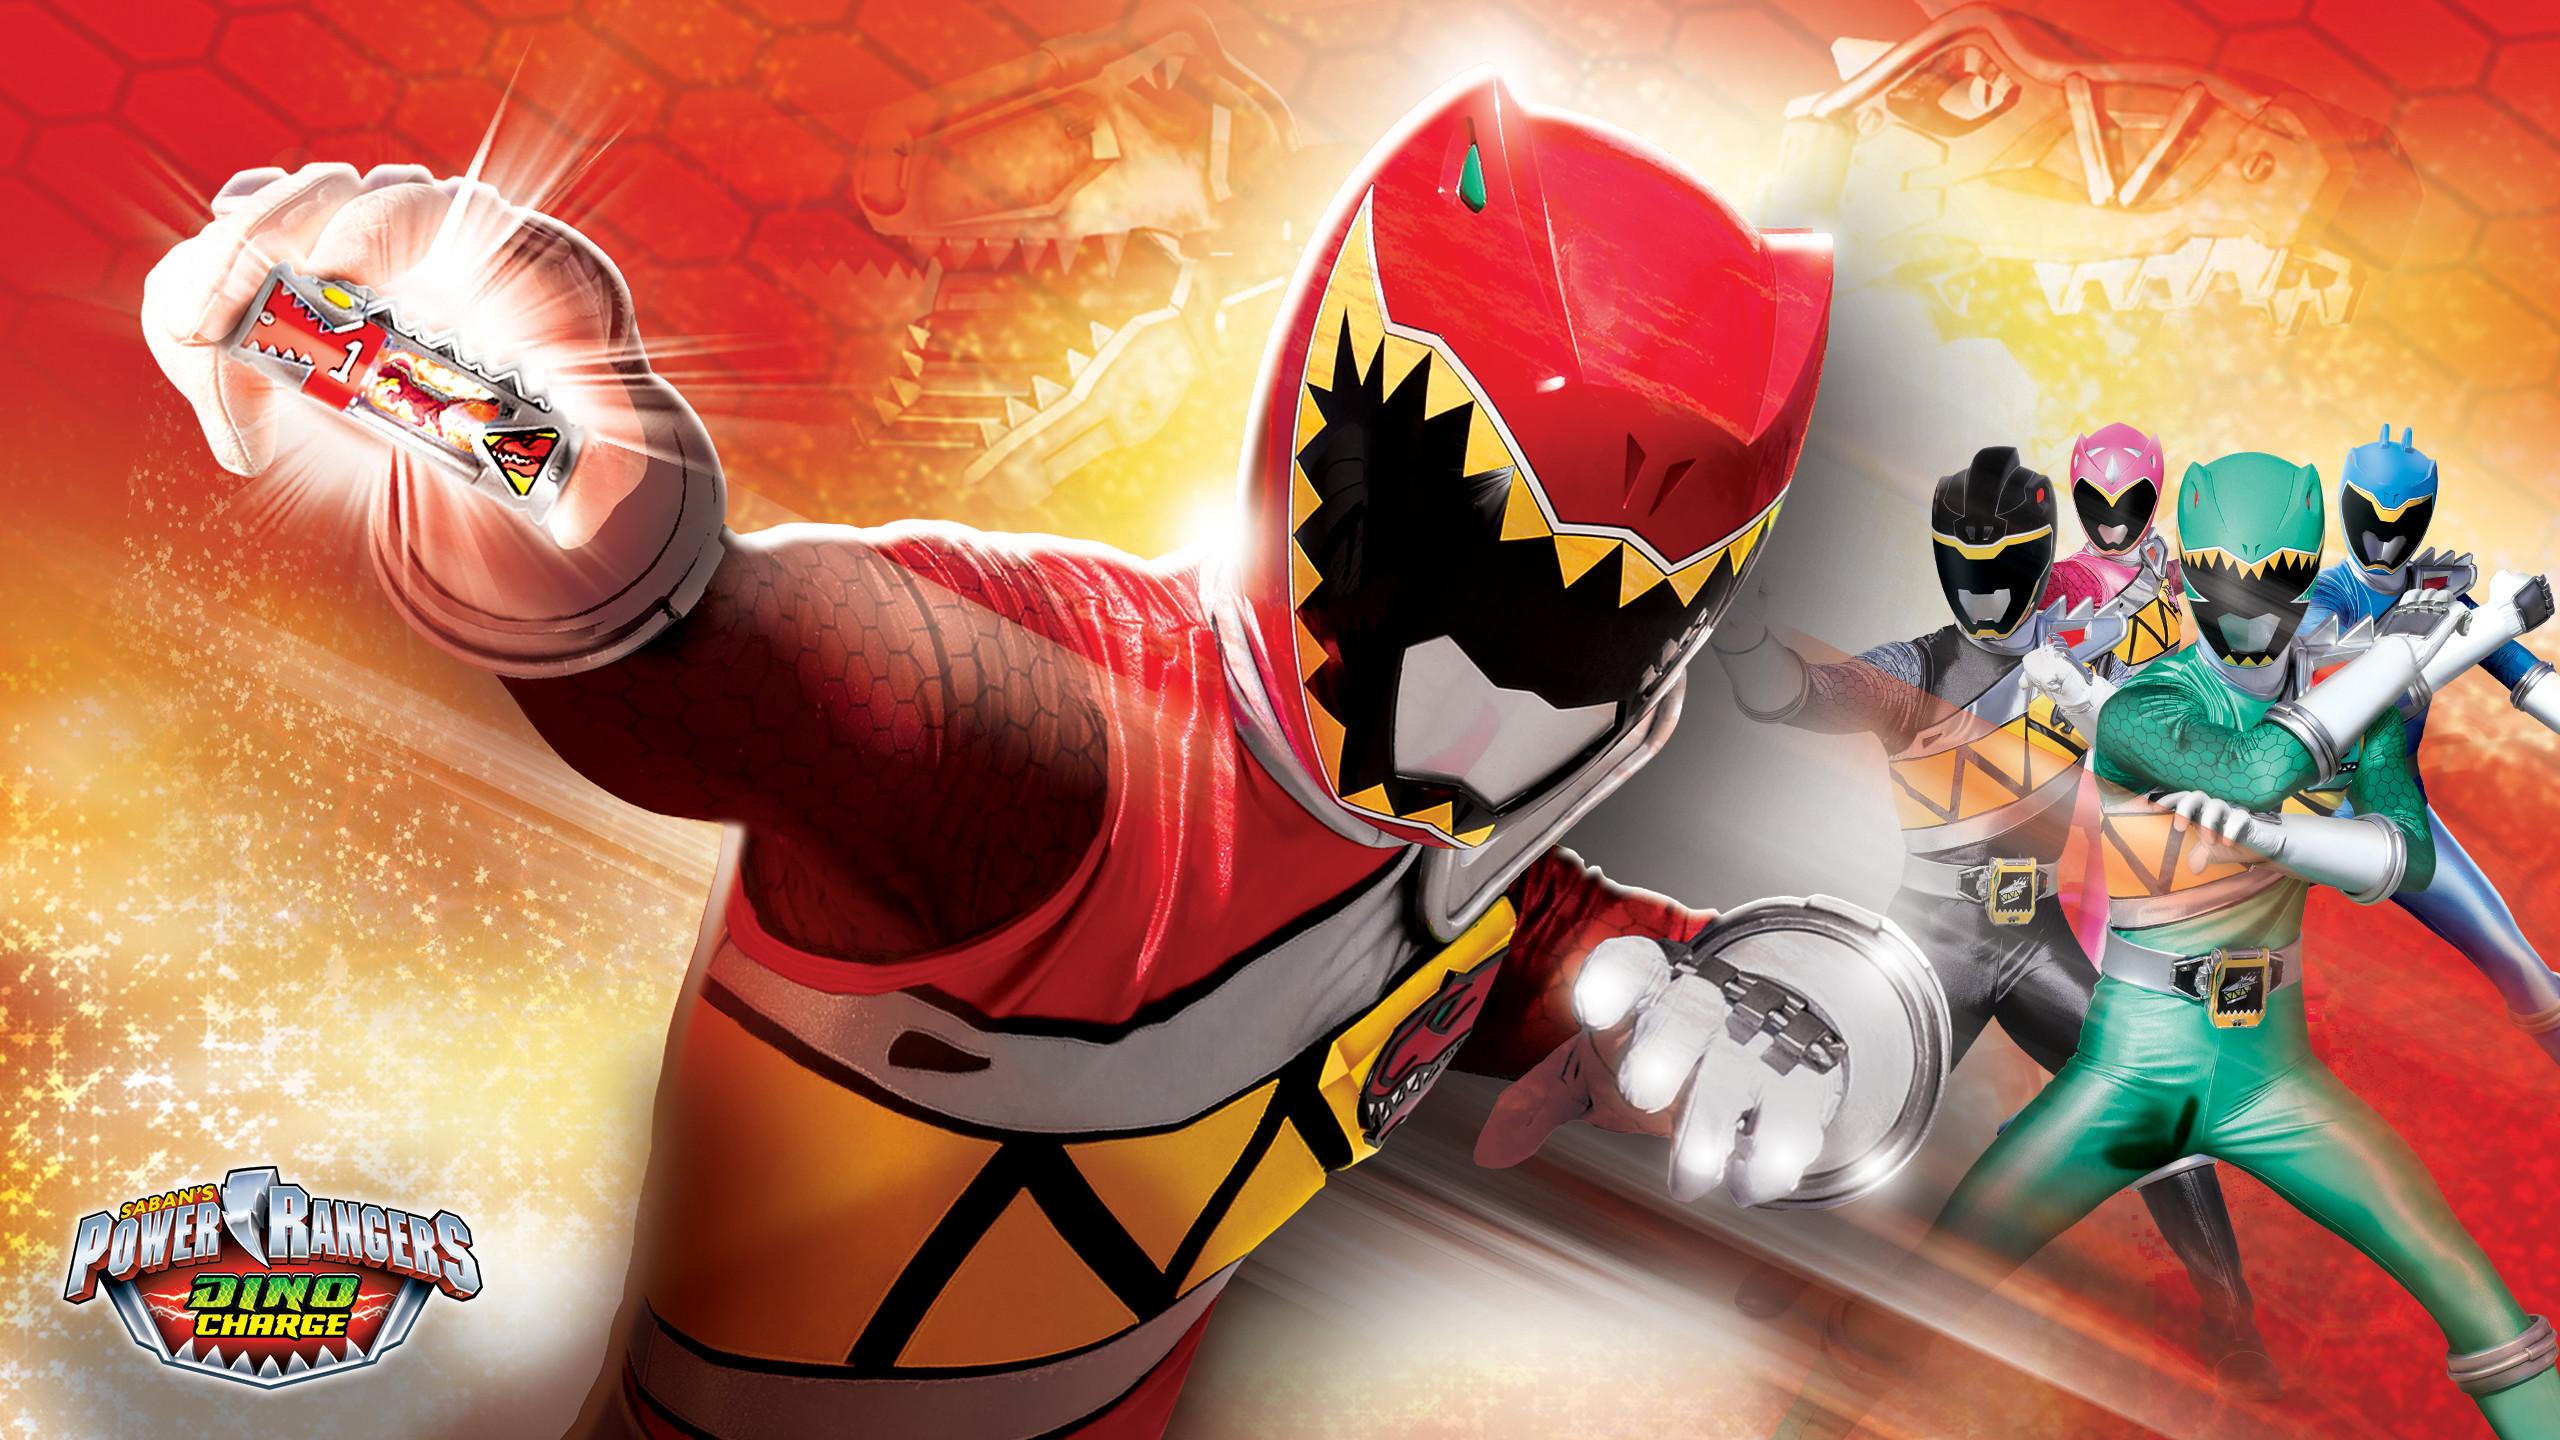 146 Power Rangers Dino Charge